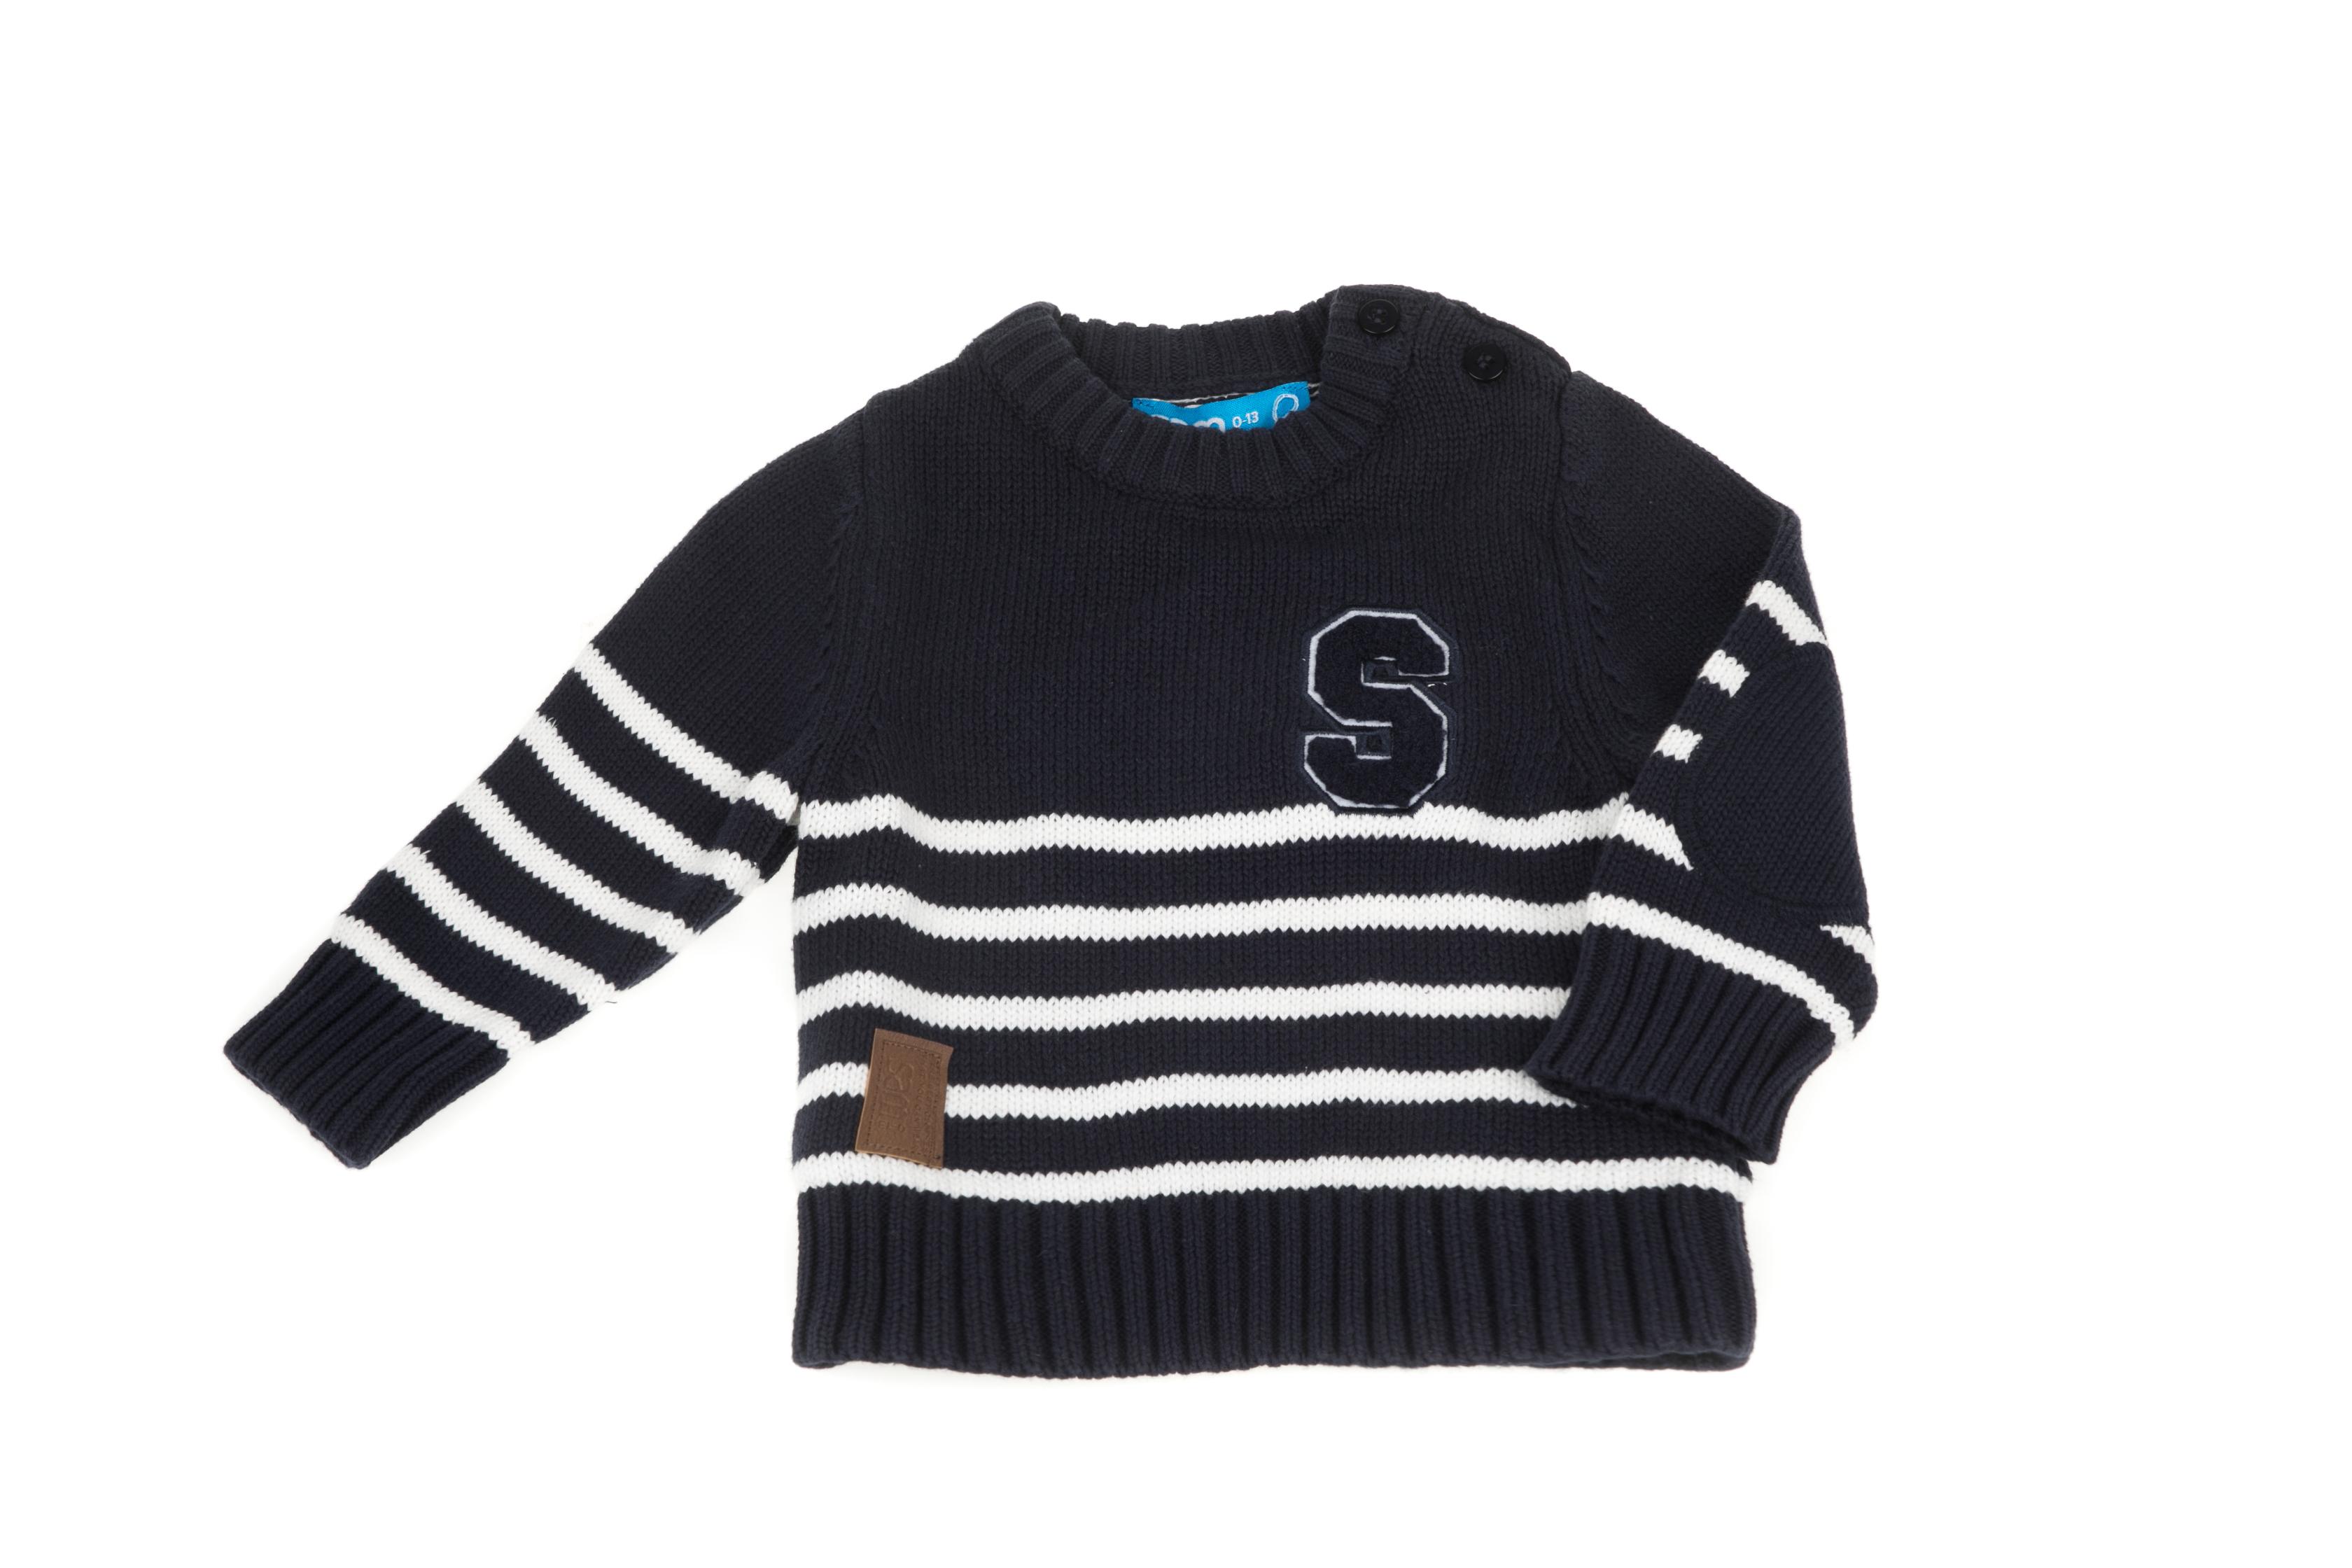 SAM 0-13 - Βρεφικό πουλόβερ με ρίγες SAM 0-13 μπλε 7c541b057bd